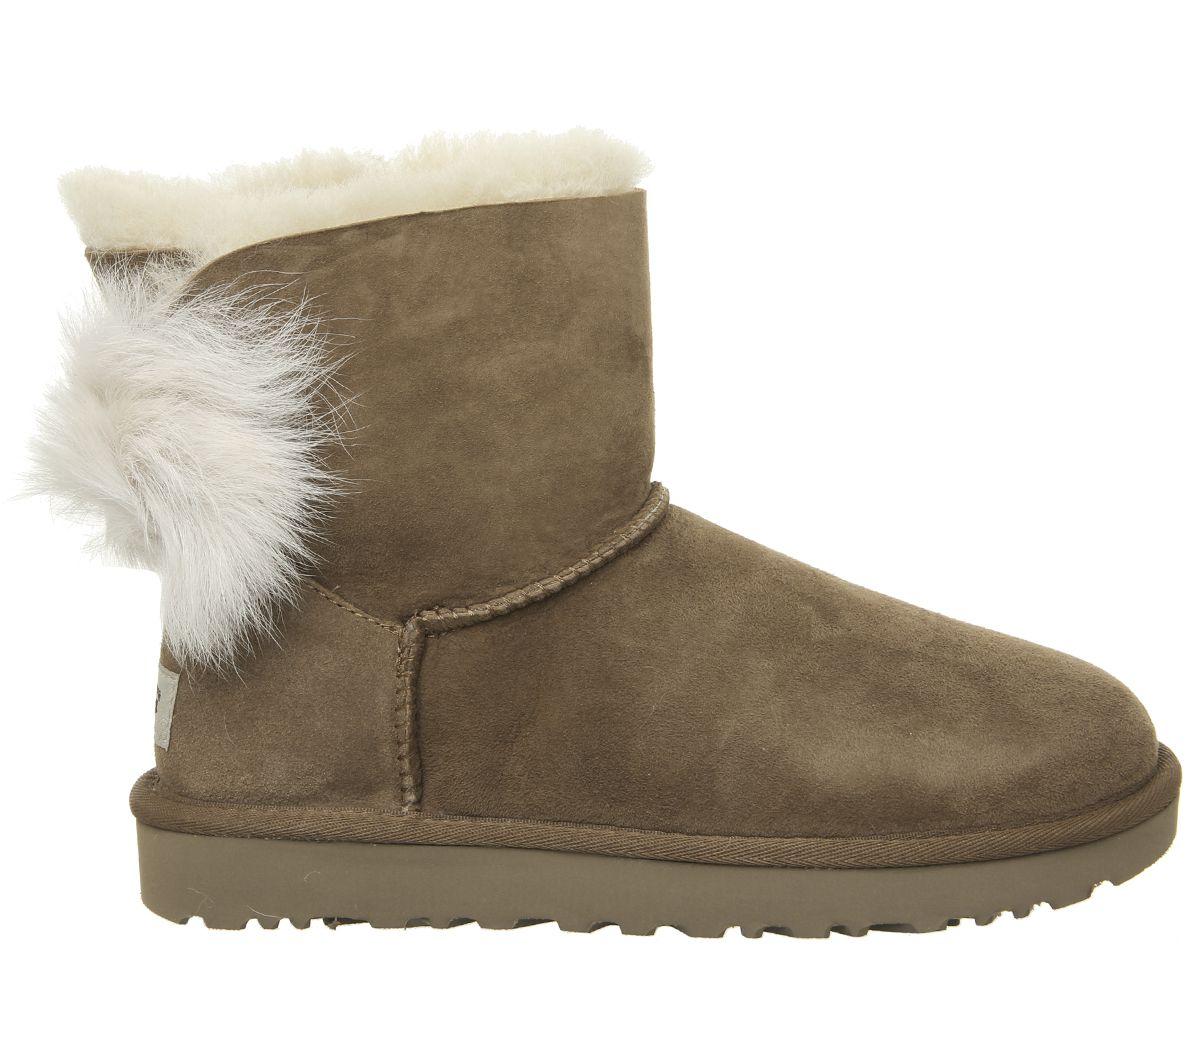 c08cae5f72a Fluff Bow Mini Boots